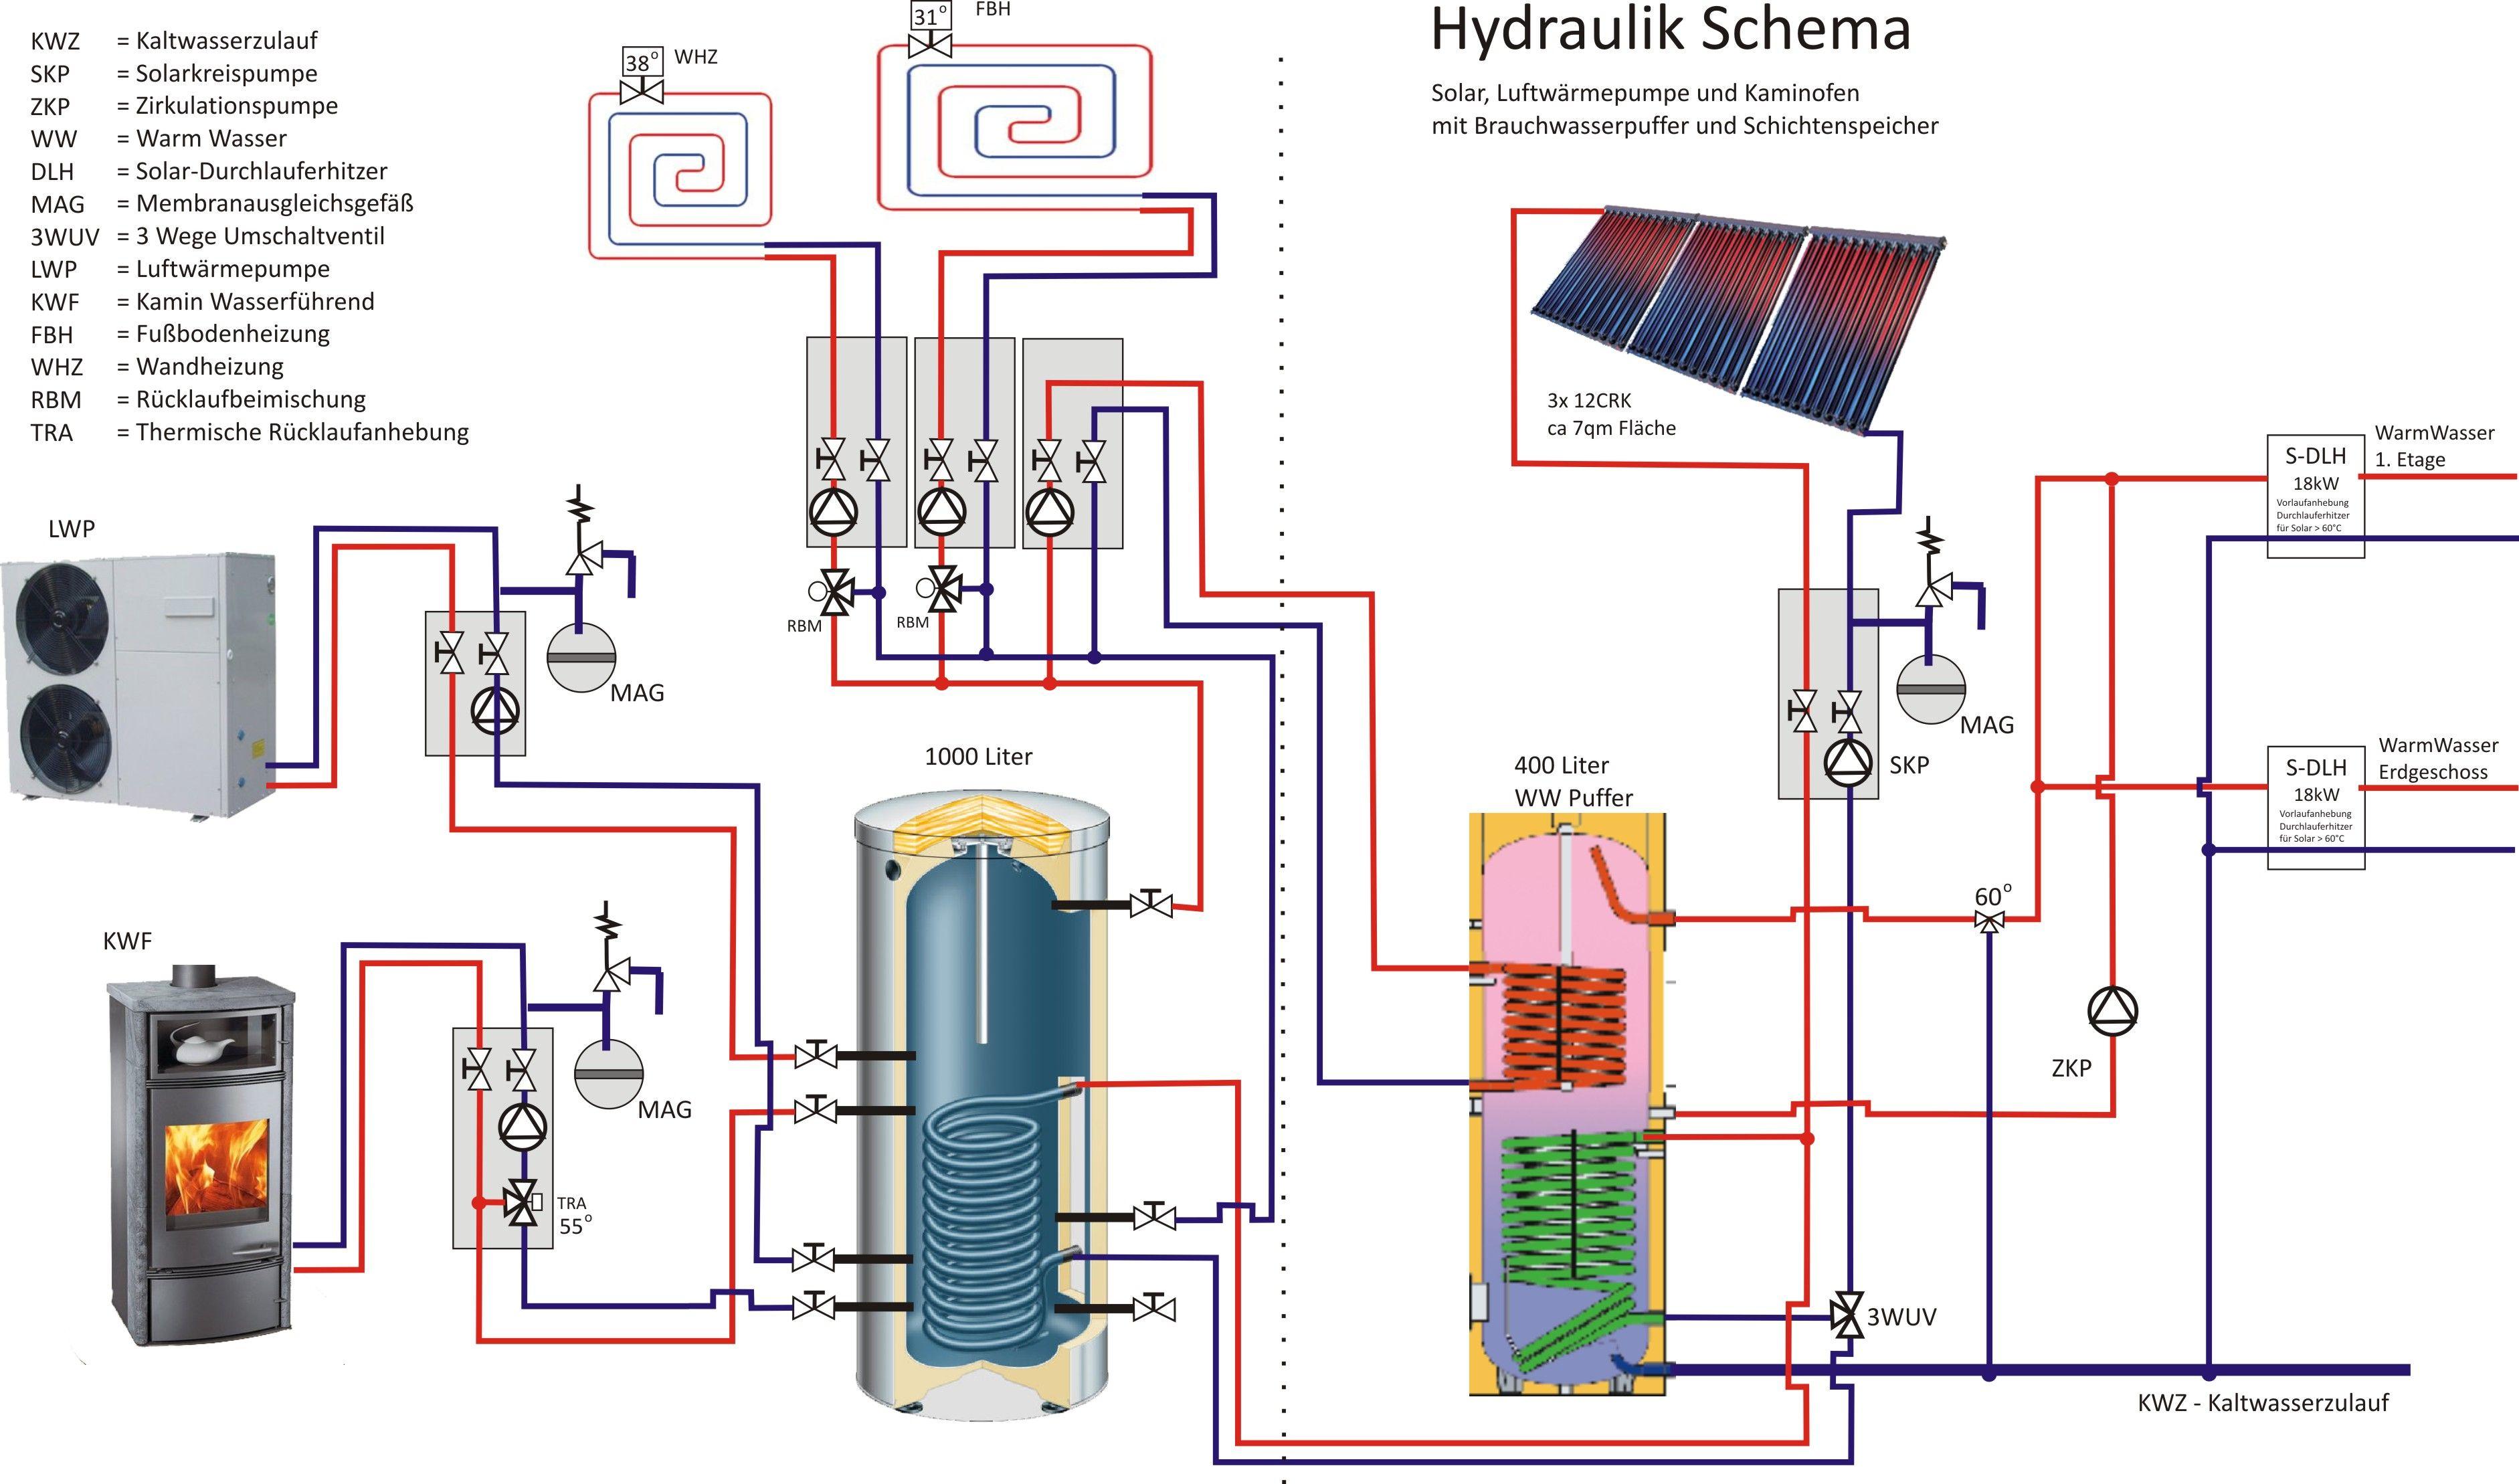 Www.viessmann.com Vires Vitodesk Schemes PS4801431_01 Documents  PS4801431_01.pdf | Hydraulikschema | Pinterest